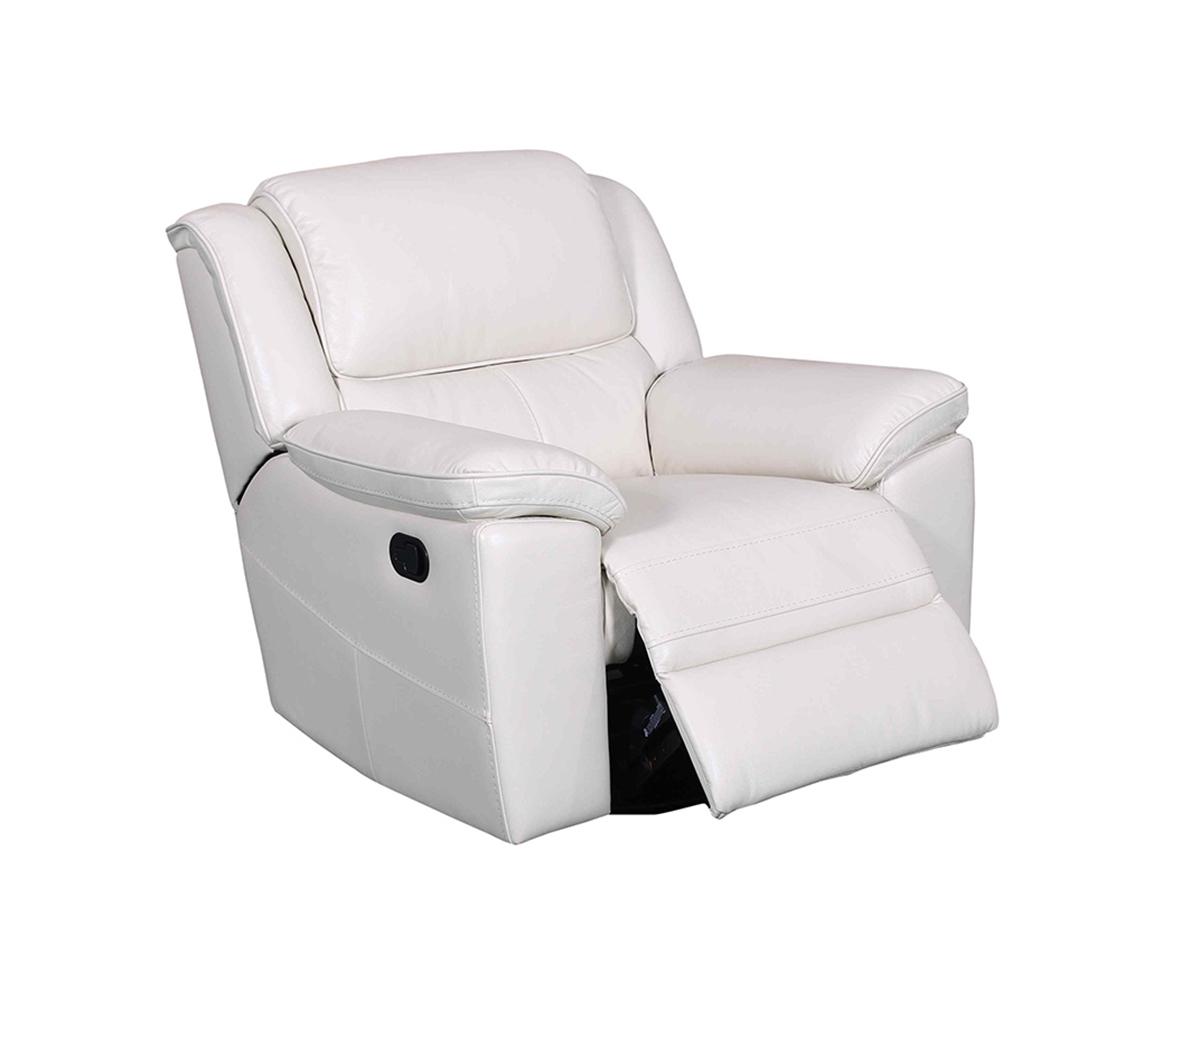 Barcalounger Laguna Swivel Glider Recliner Chair - Cashmere White/Leather Match